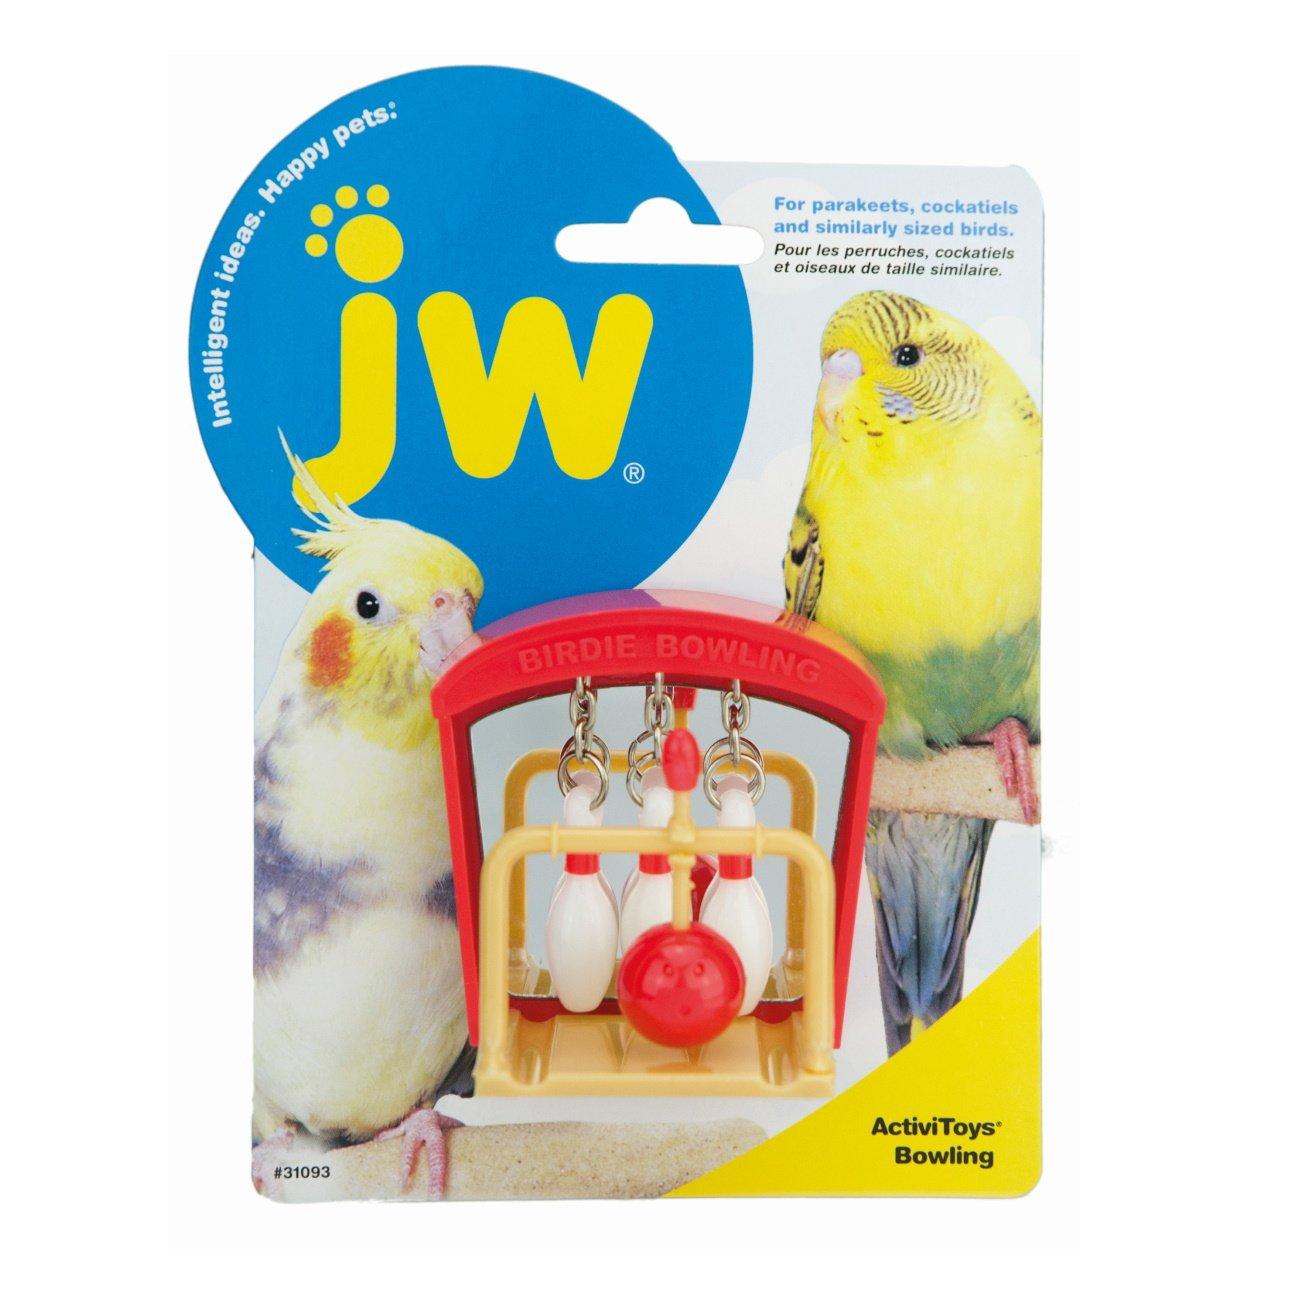 jw-activitoy-birdie-bowling